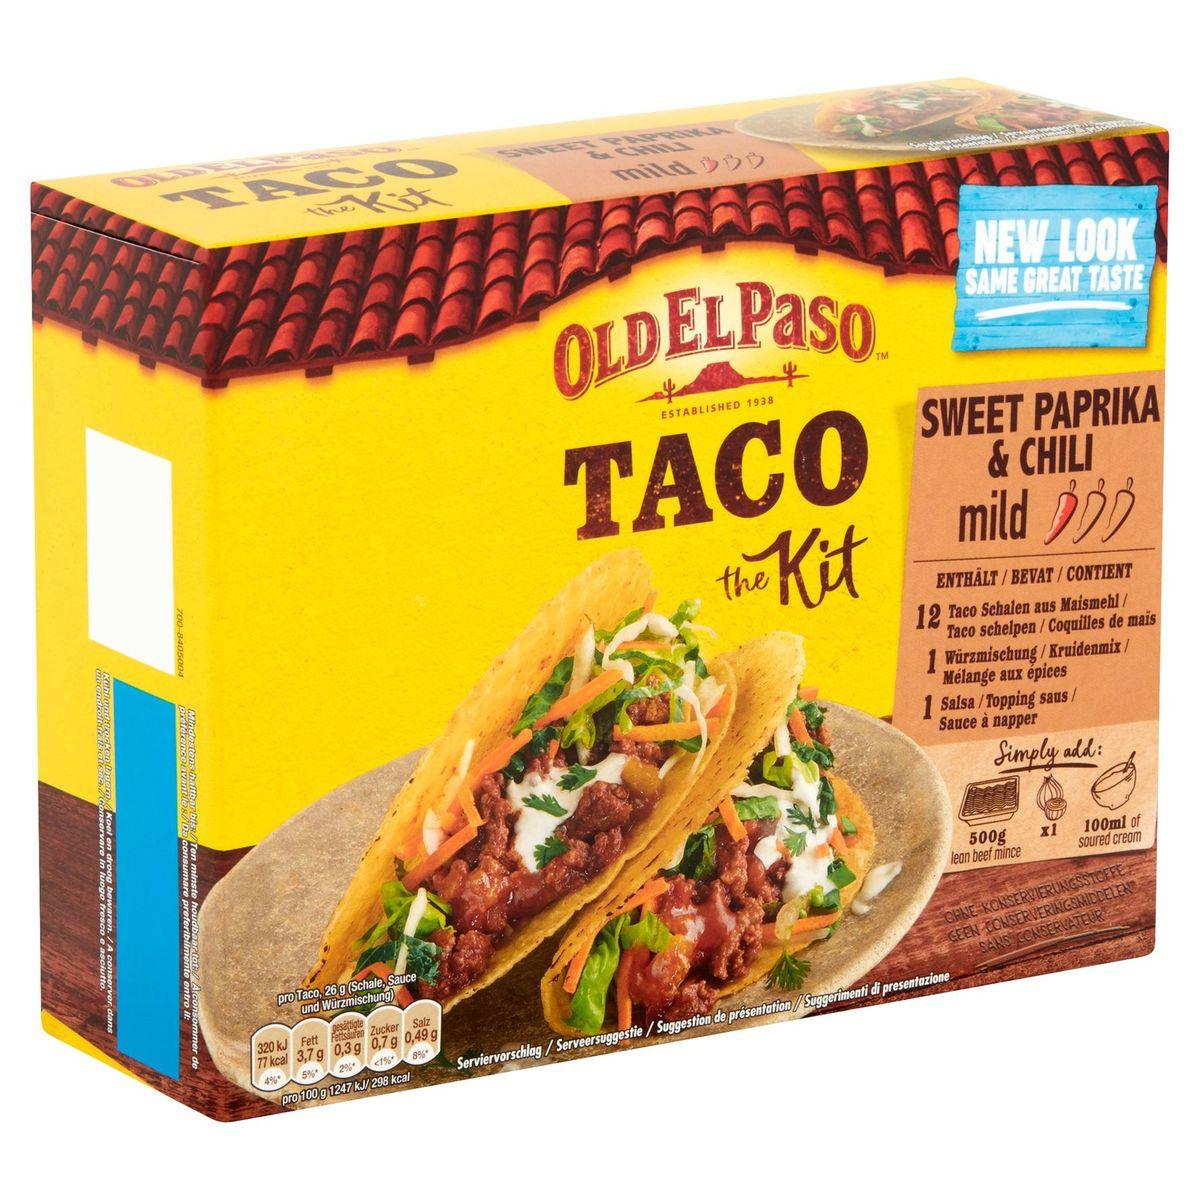 Old El Paso Taco the Kit Sweet Paprika & Chili 308 g